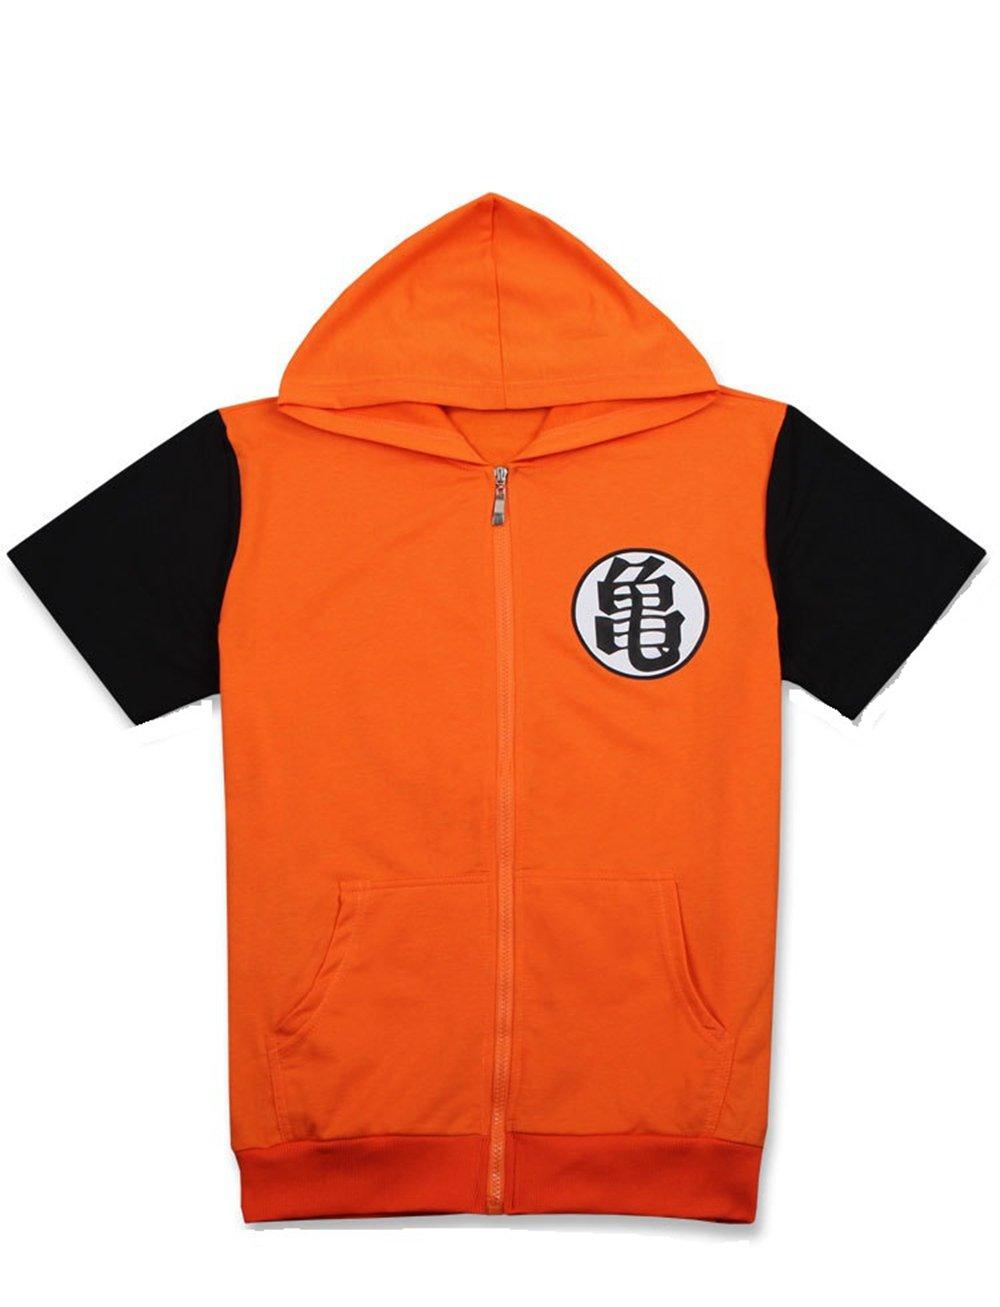 COSAUG Dragon Ball Hoodie Short Sleeves Coat Jacket (XL) by COSAUG